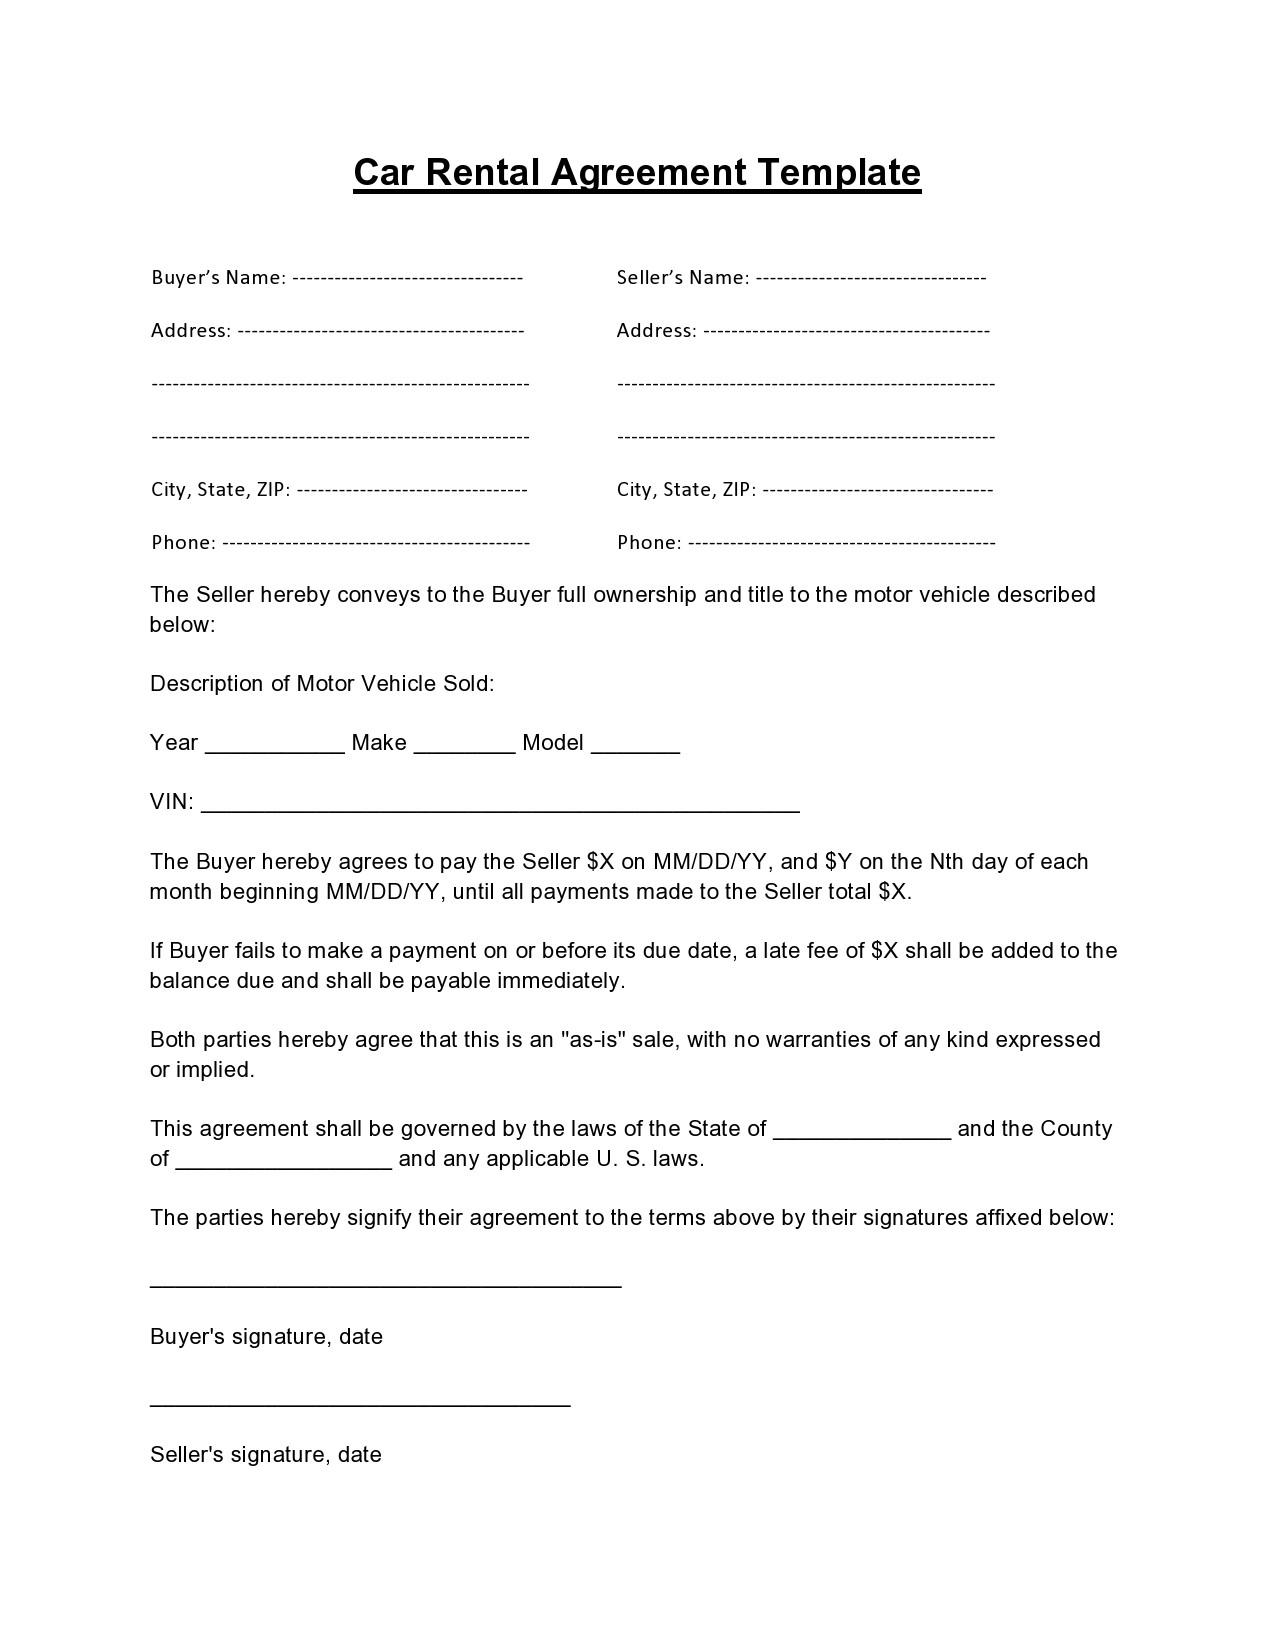 Free car rental agreement 24